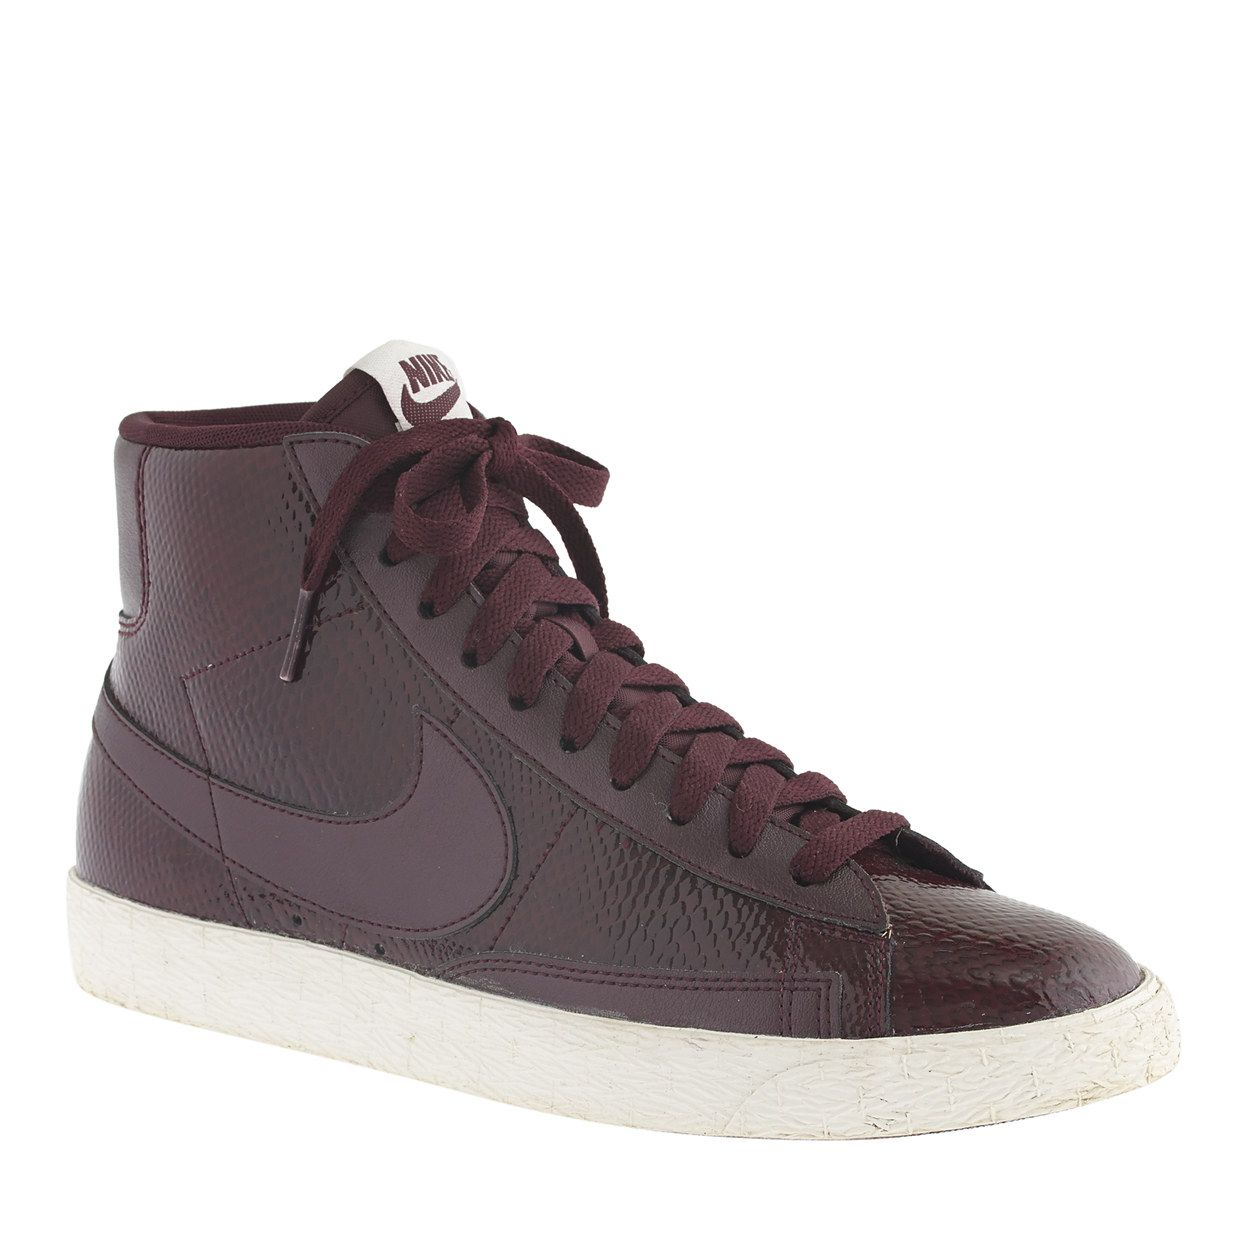 Women's Nike® Blazer mid vintage sneakers